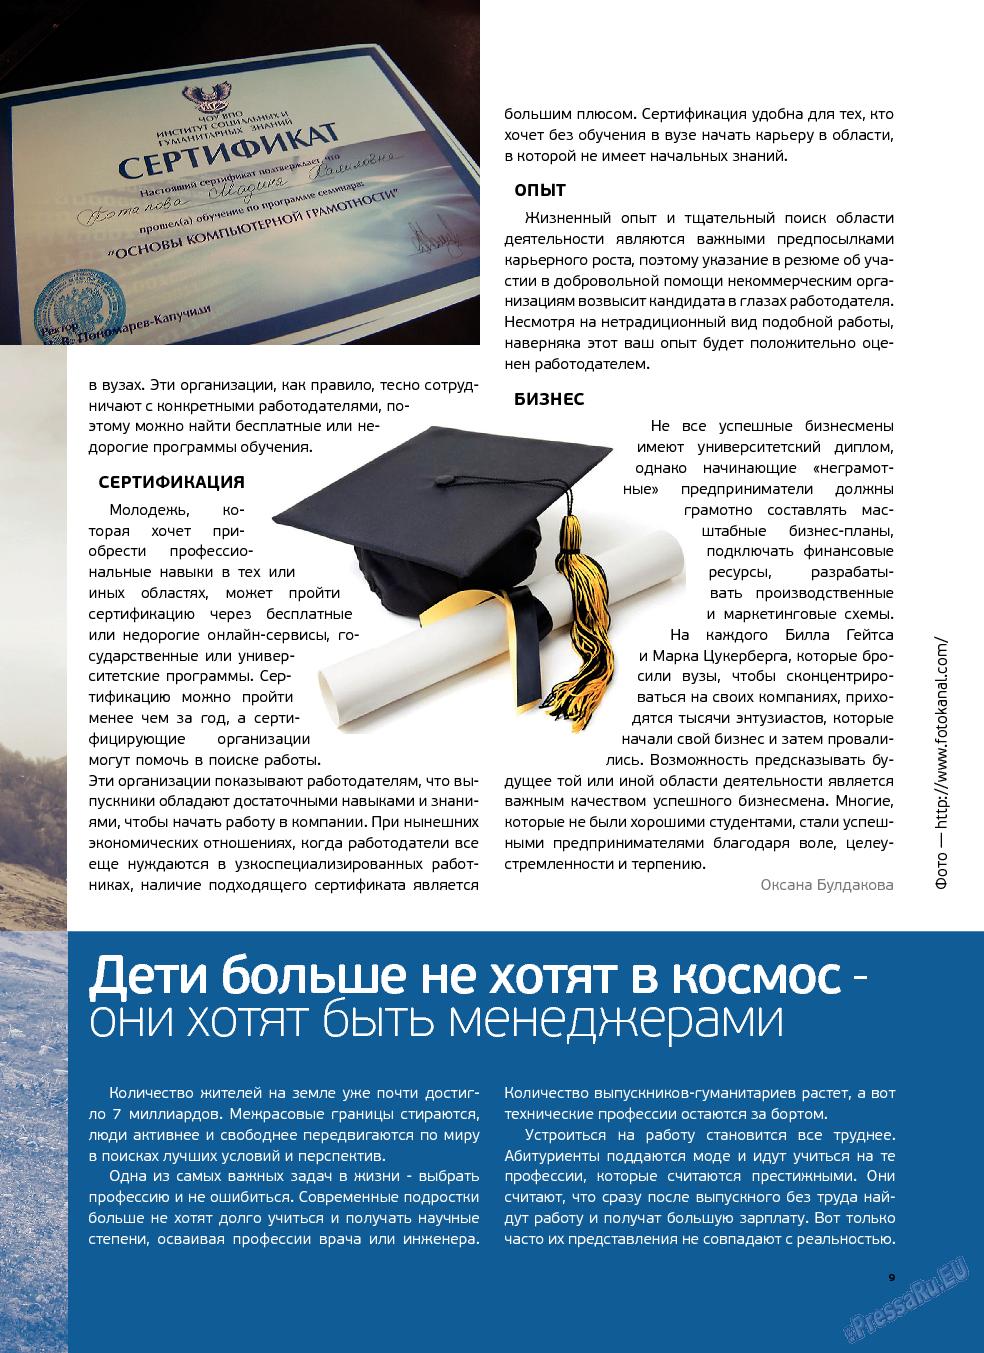 Артек (журнал). 2013 год, номер 3, стр. 11